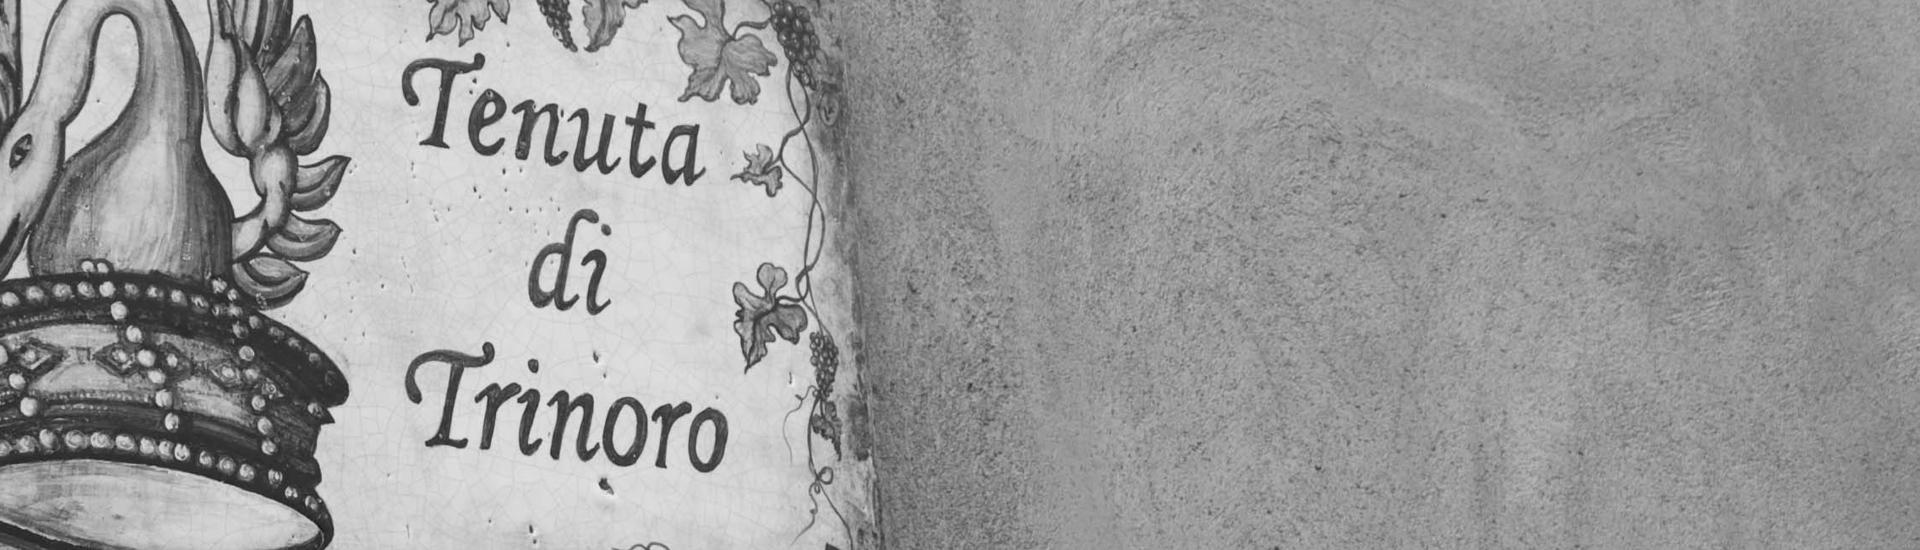 Weine - Rarität des Monats: Tenuta di Trinoro 2015 04/2018 - Slider